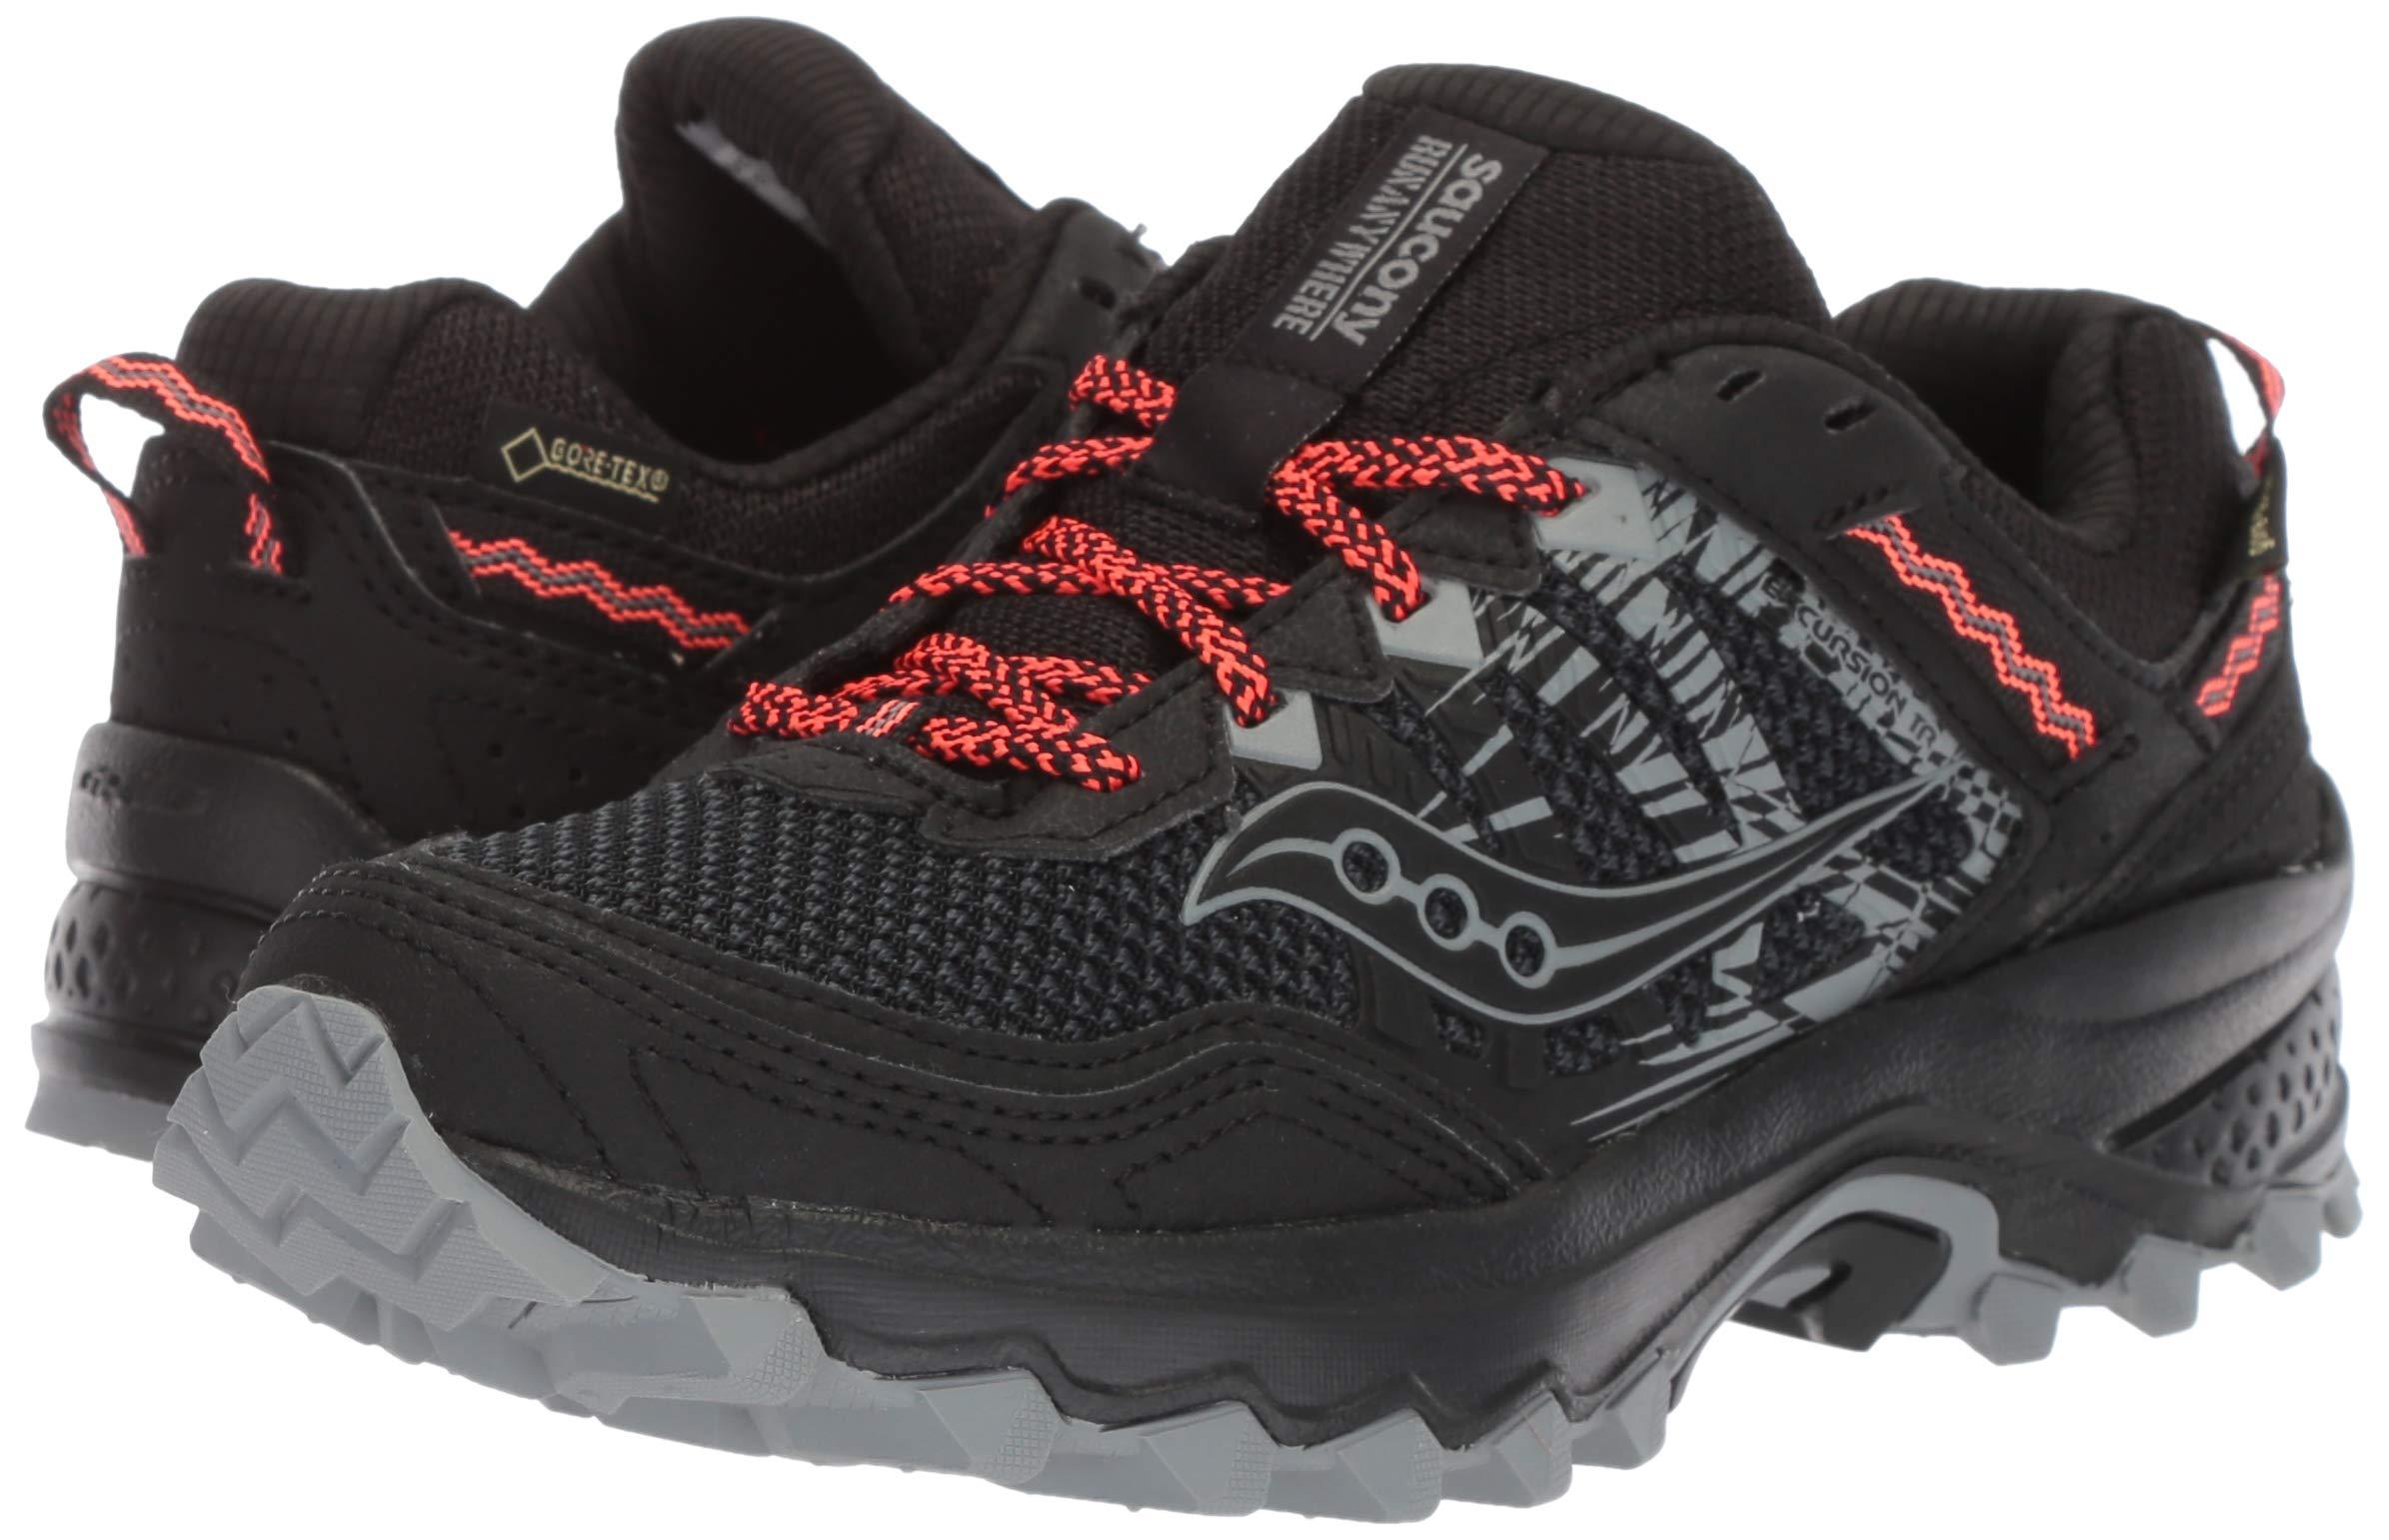 71nLOMA%2BCfL - Saucony Women's Excursion Tr12 GTX Training Shoes